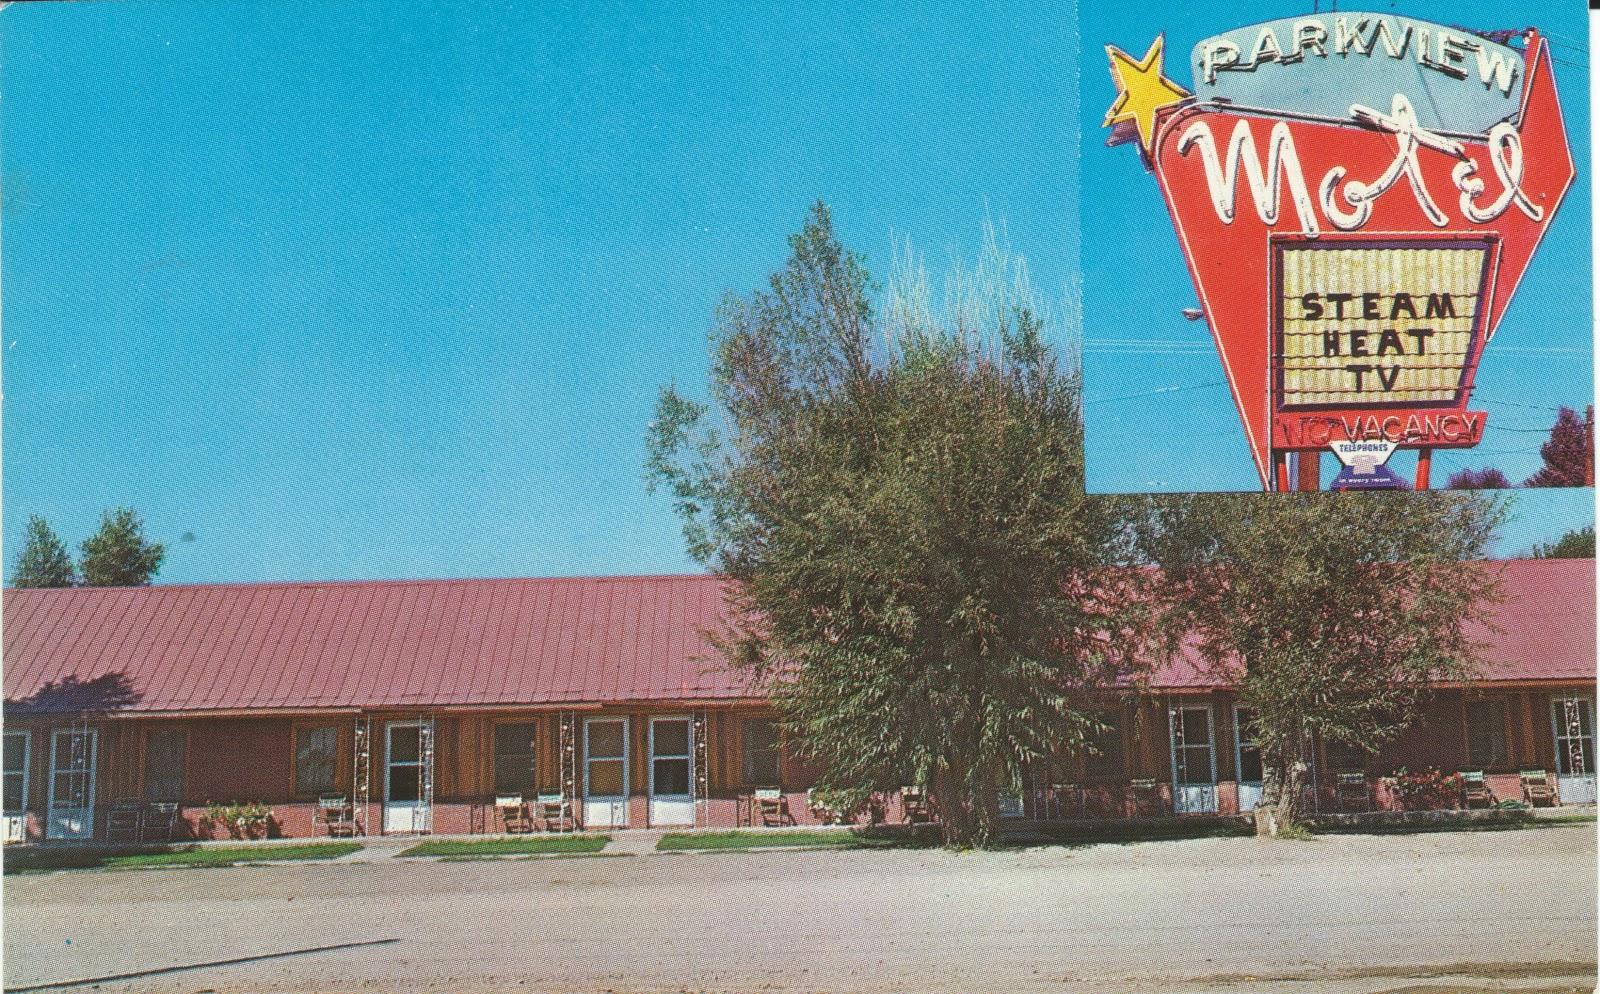 The Postcard Motel